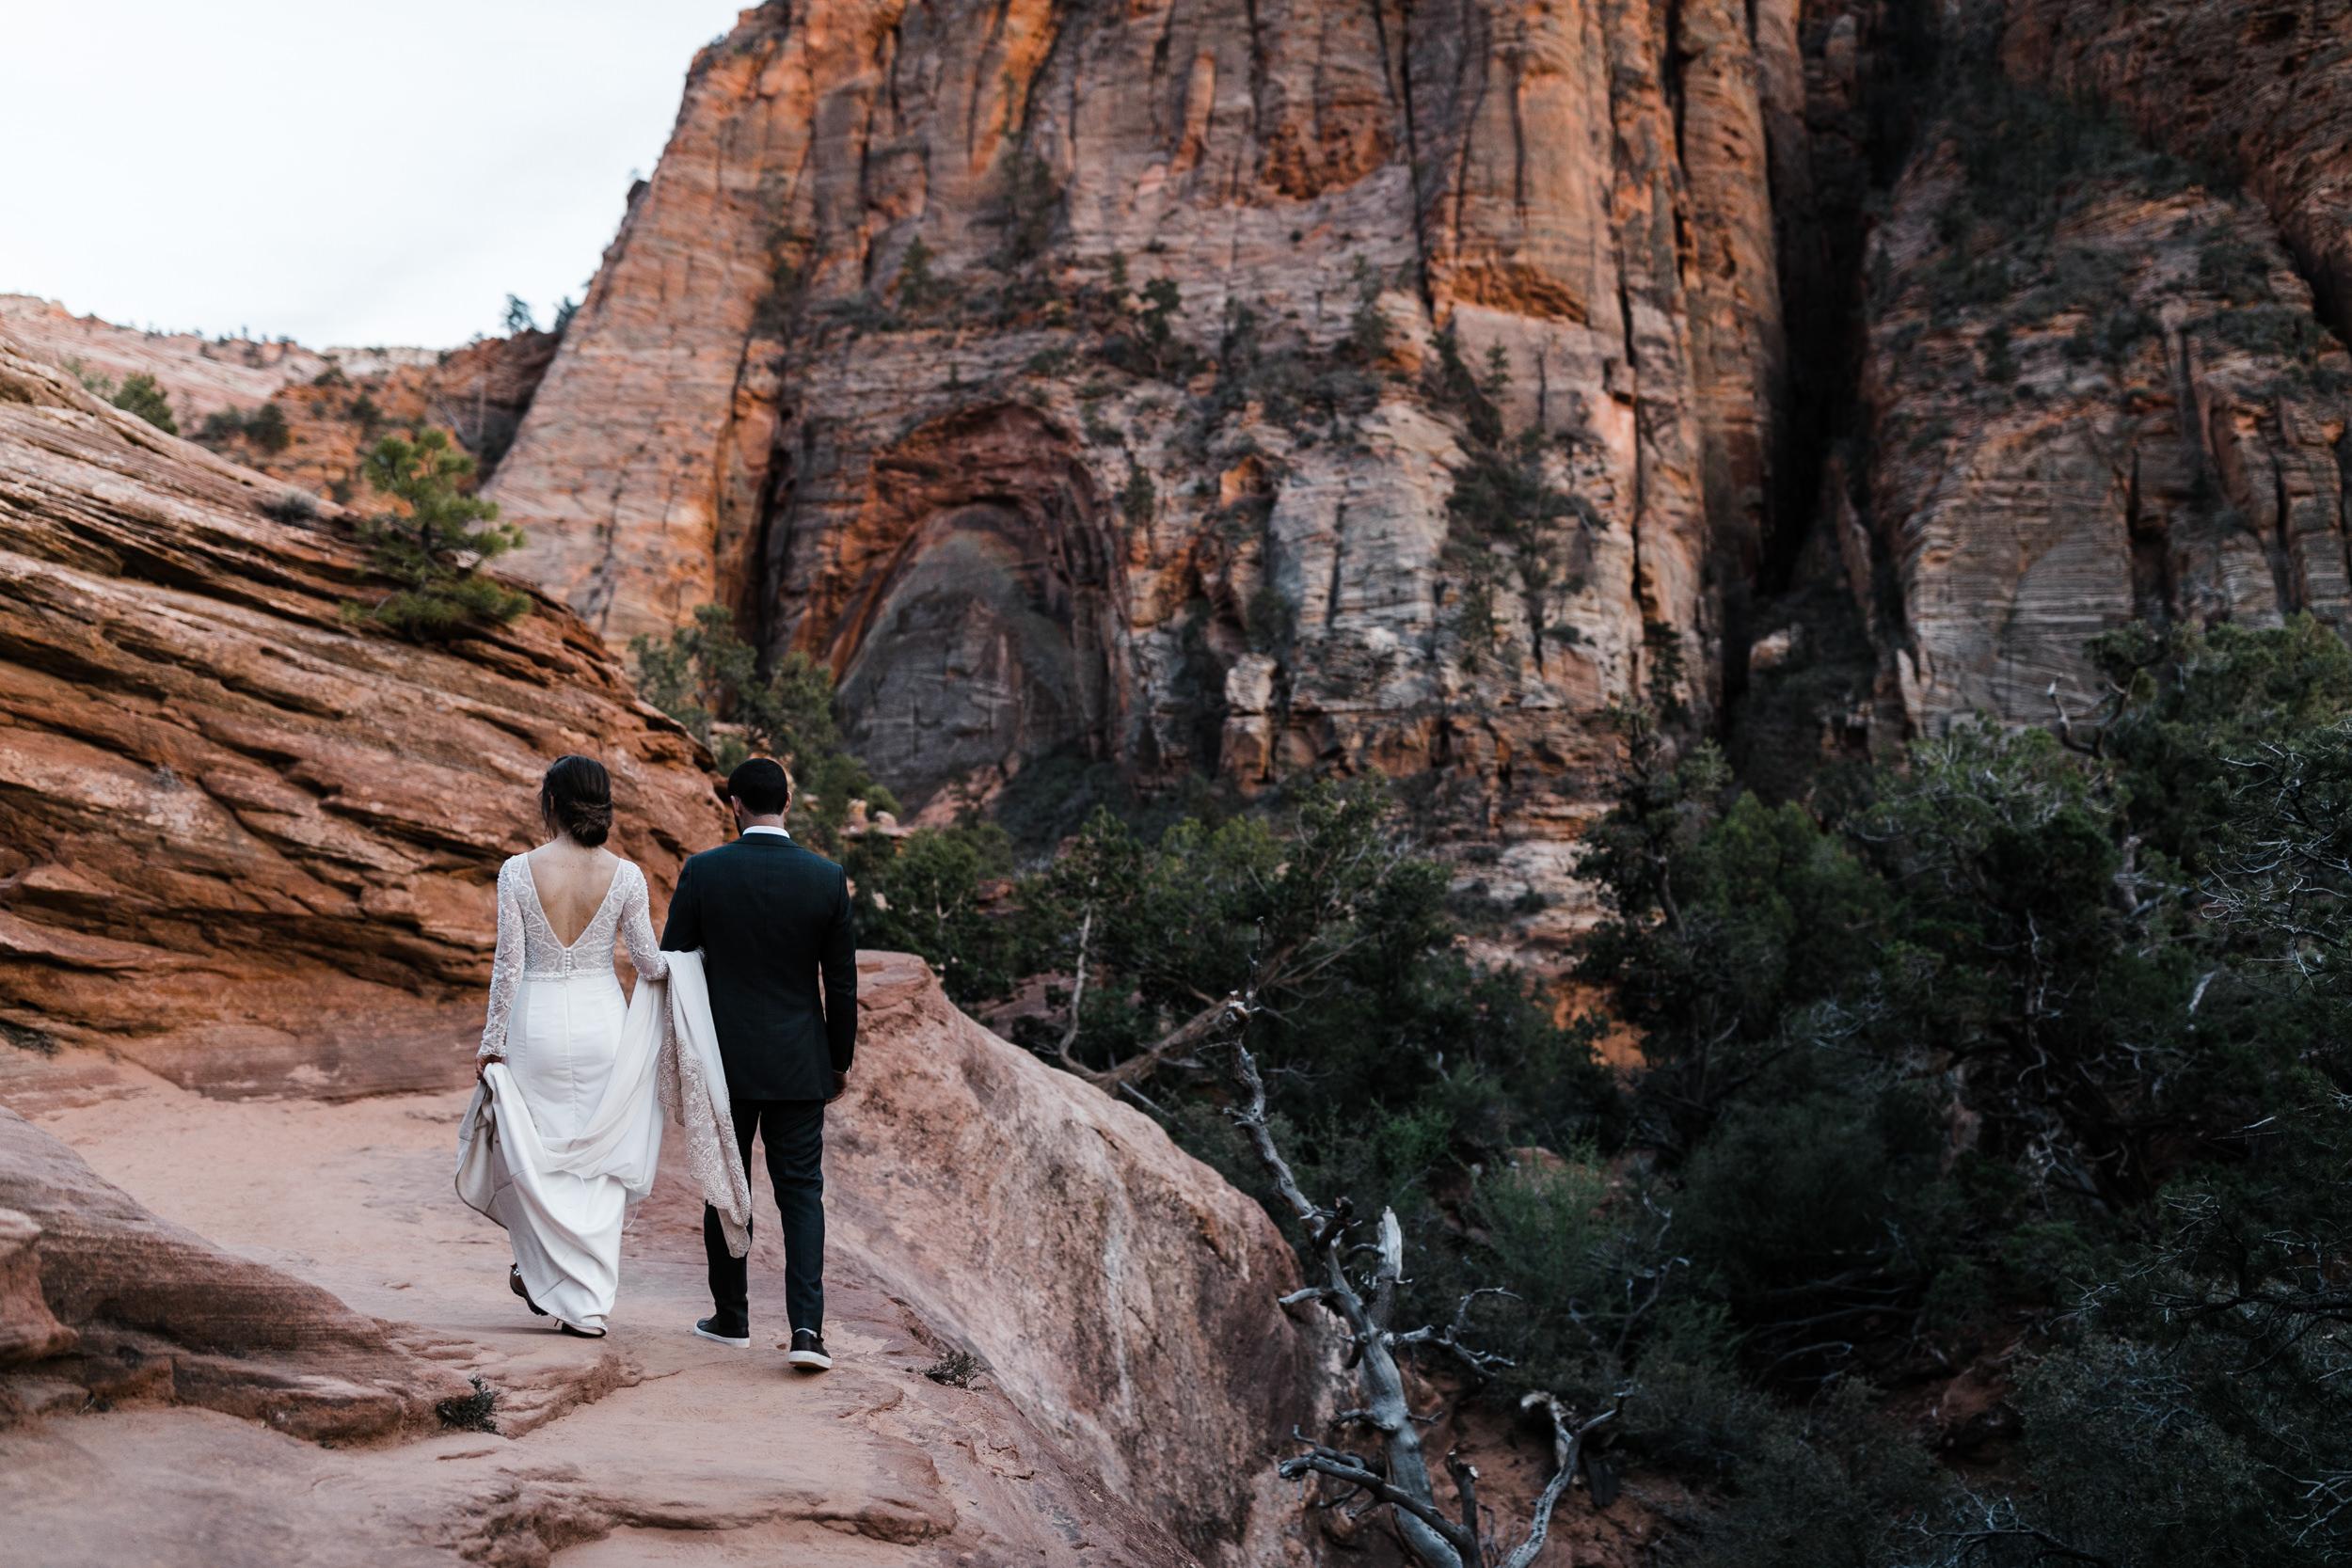 Zion-National-Park-Adventure-Wedding-Hearnes-Elopement-Photography-59.jpg